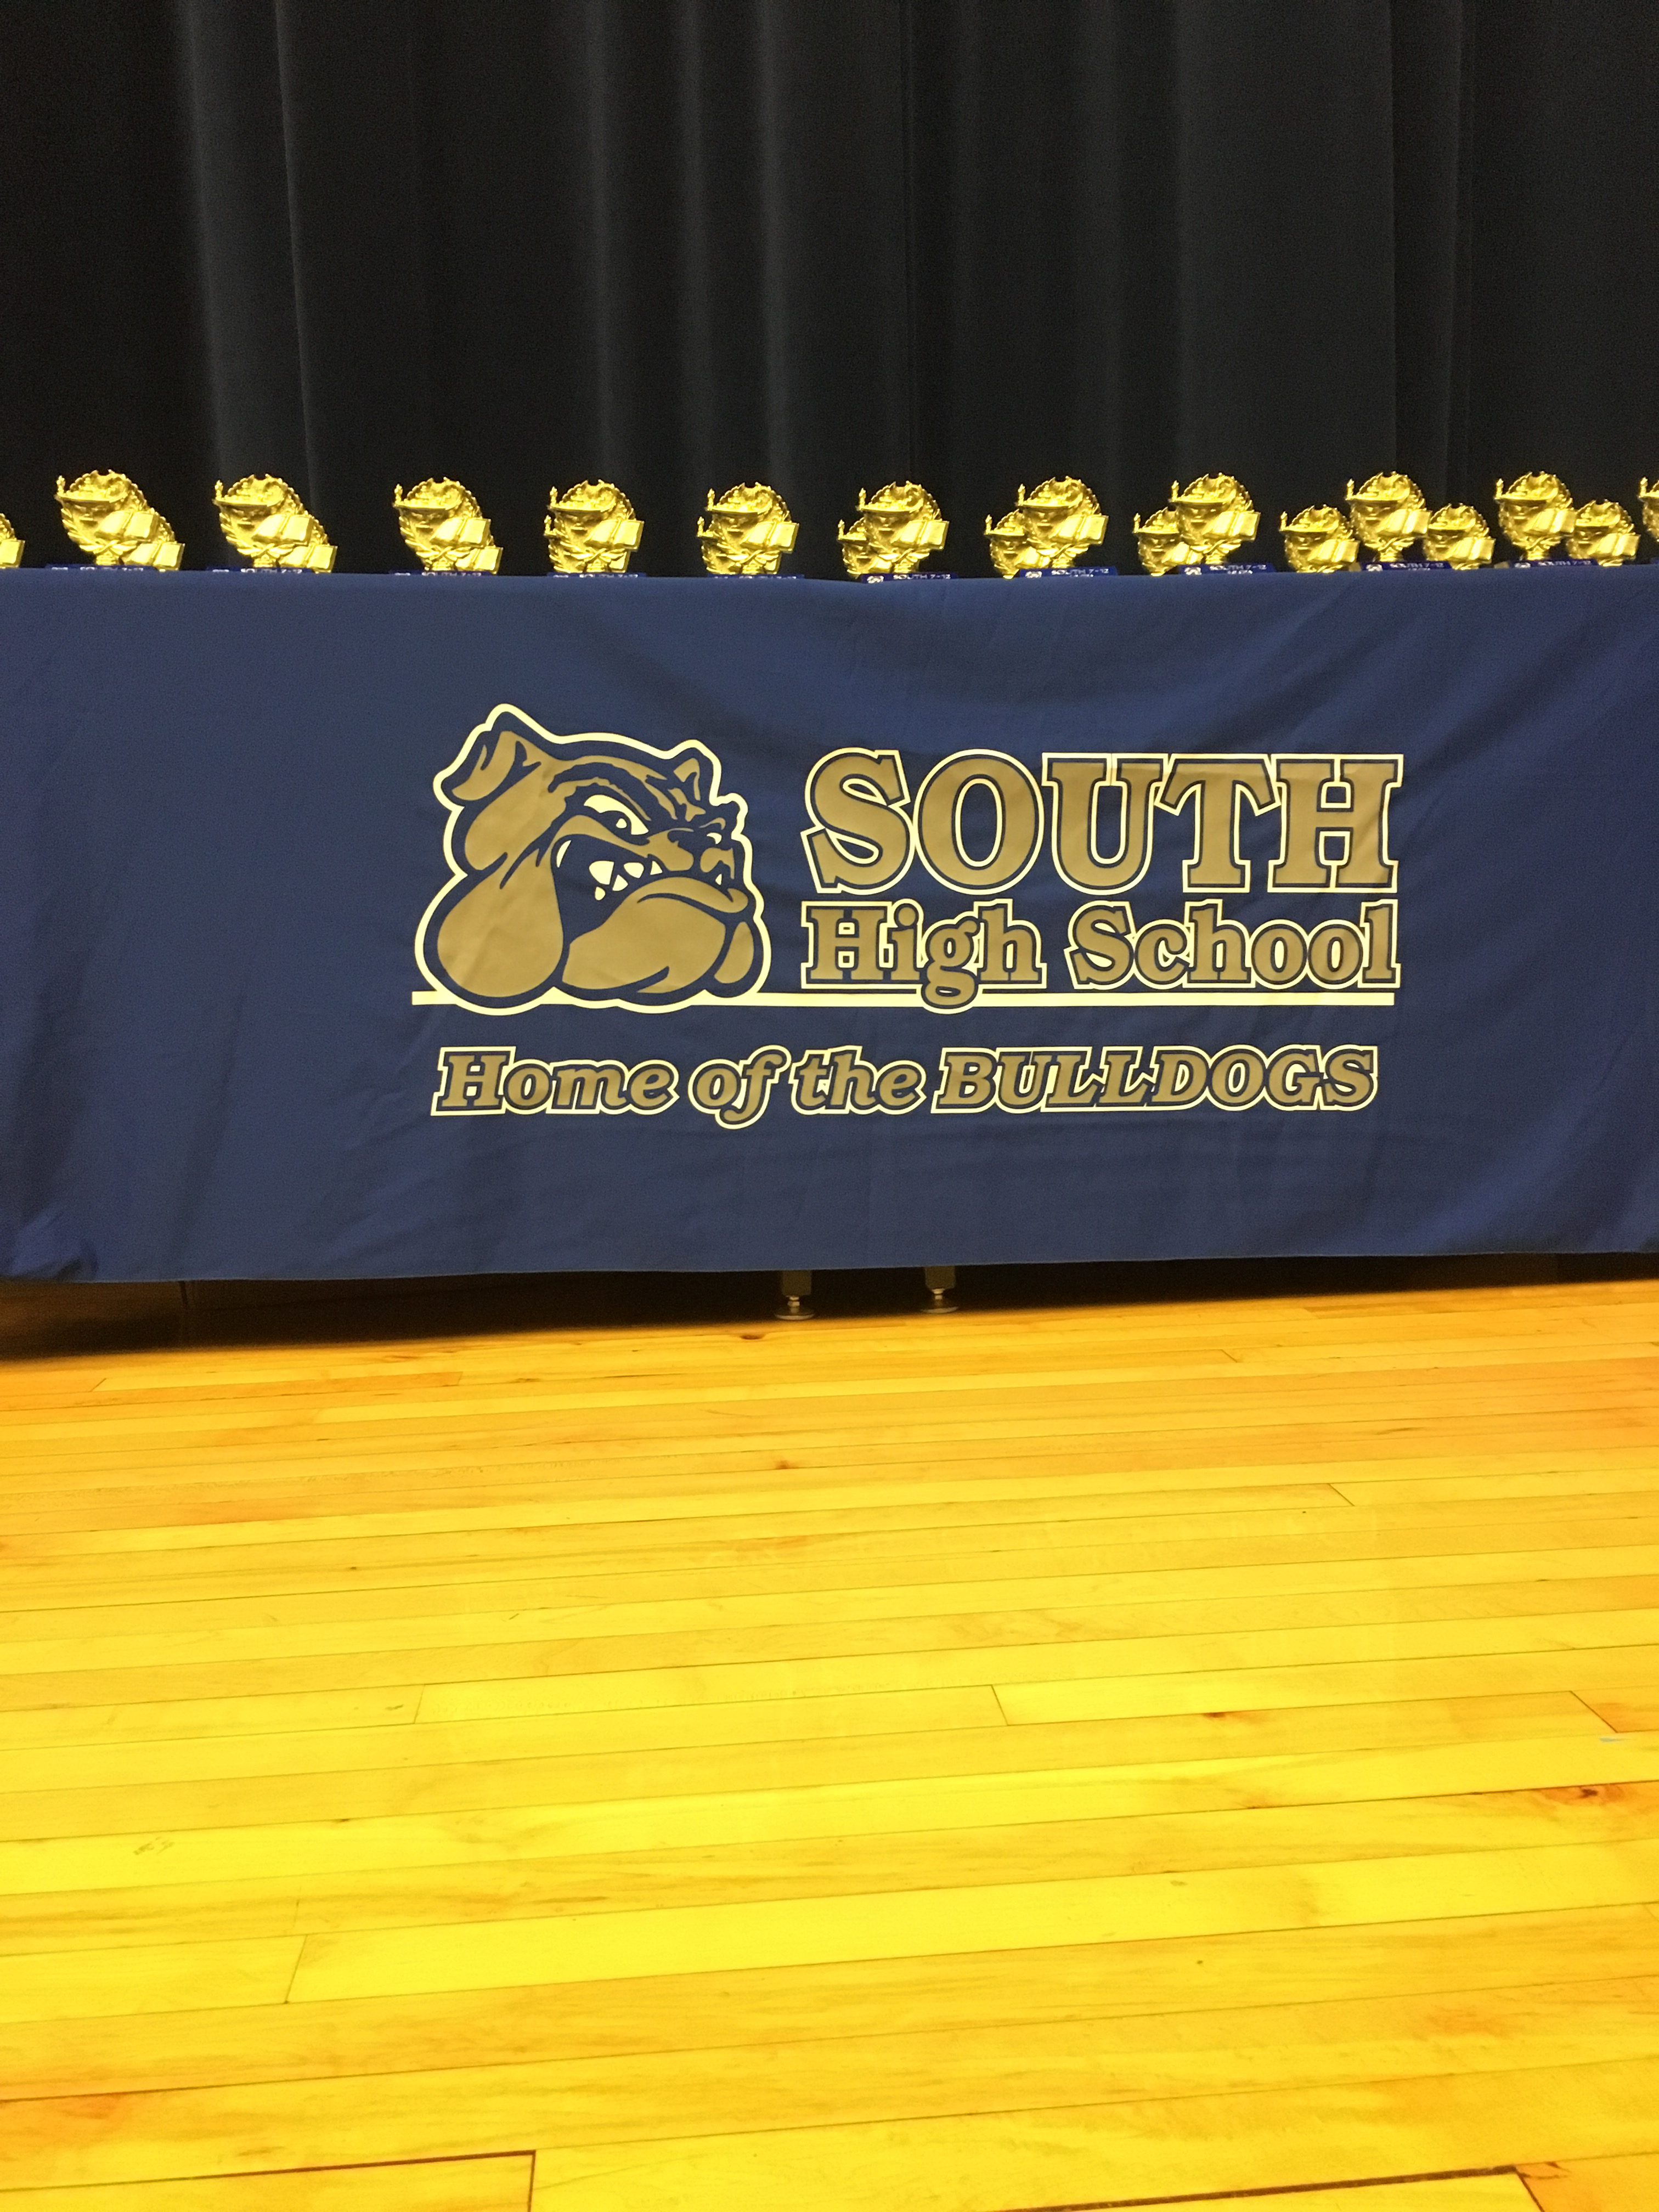 City School Tour @South High School